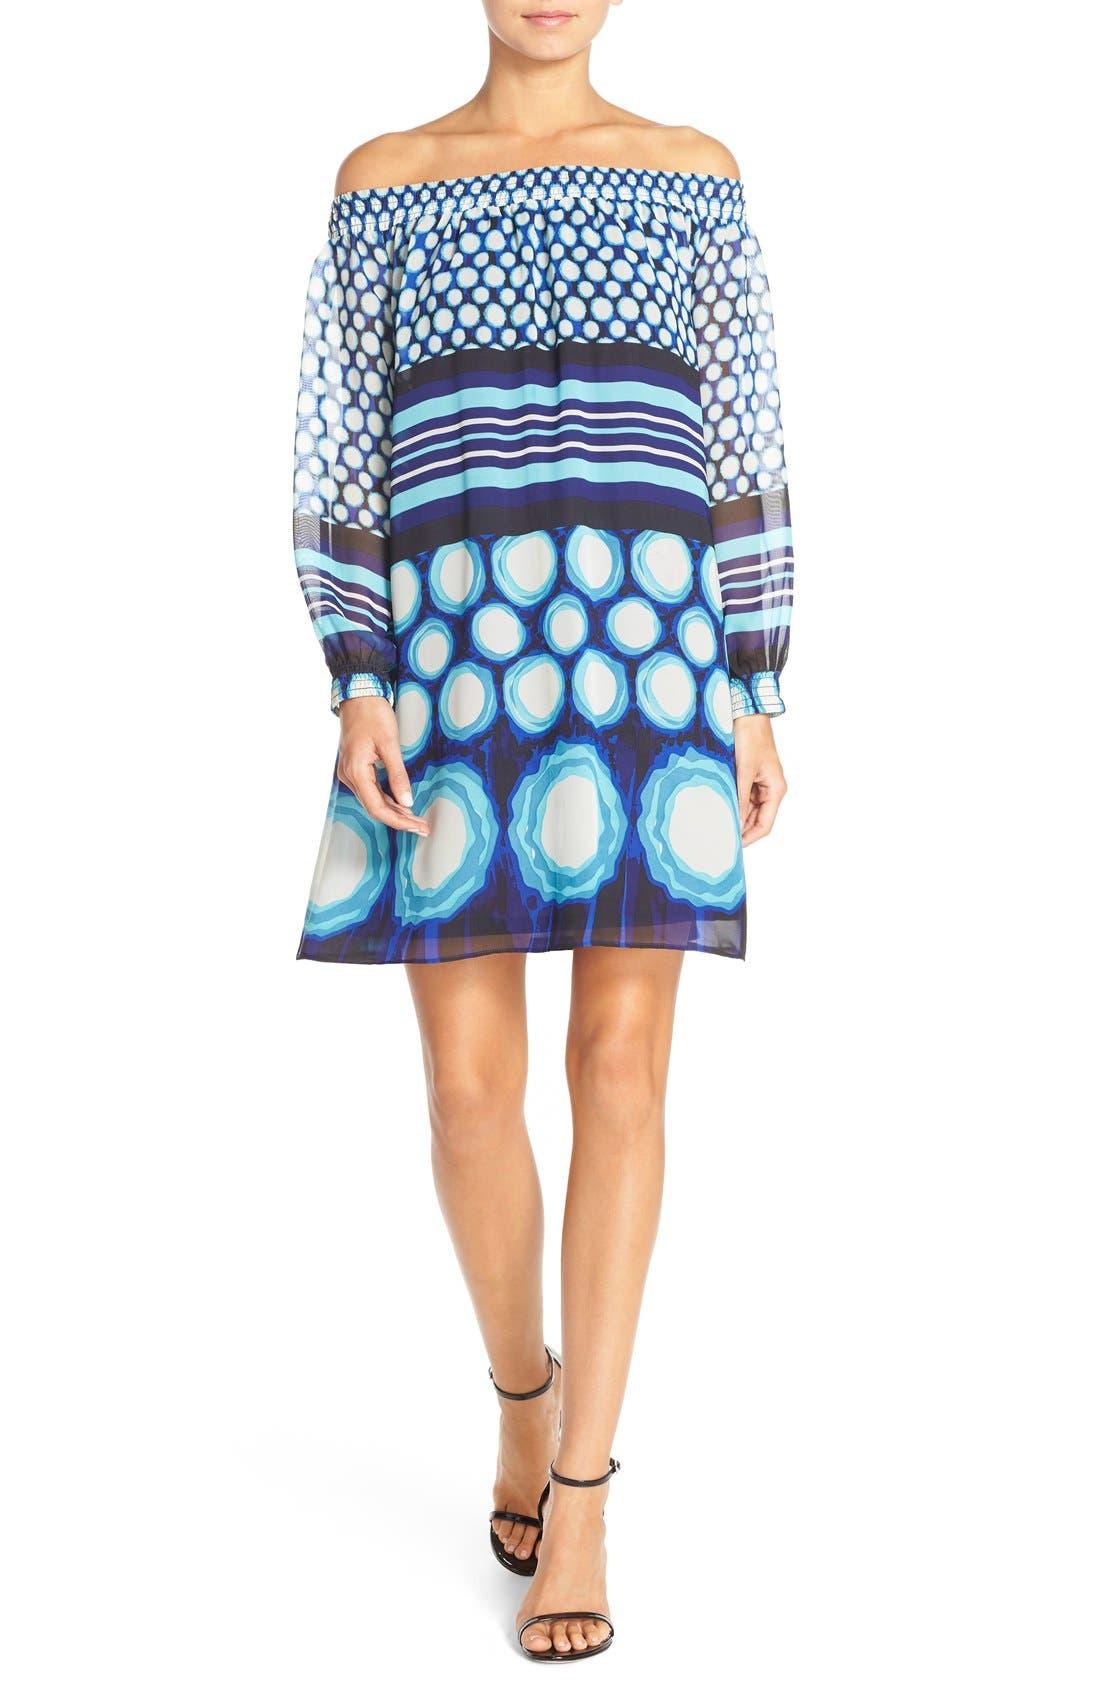 Alternate Image 1 Selected - ECI Off the Shoulder Print Chiffon Trapeze Dress